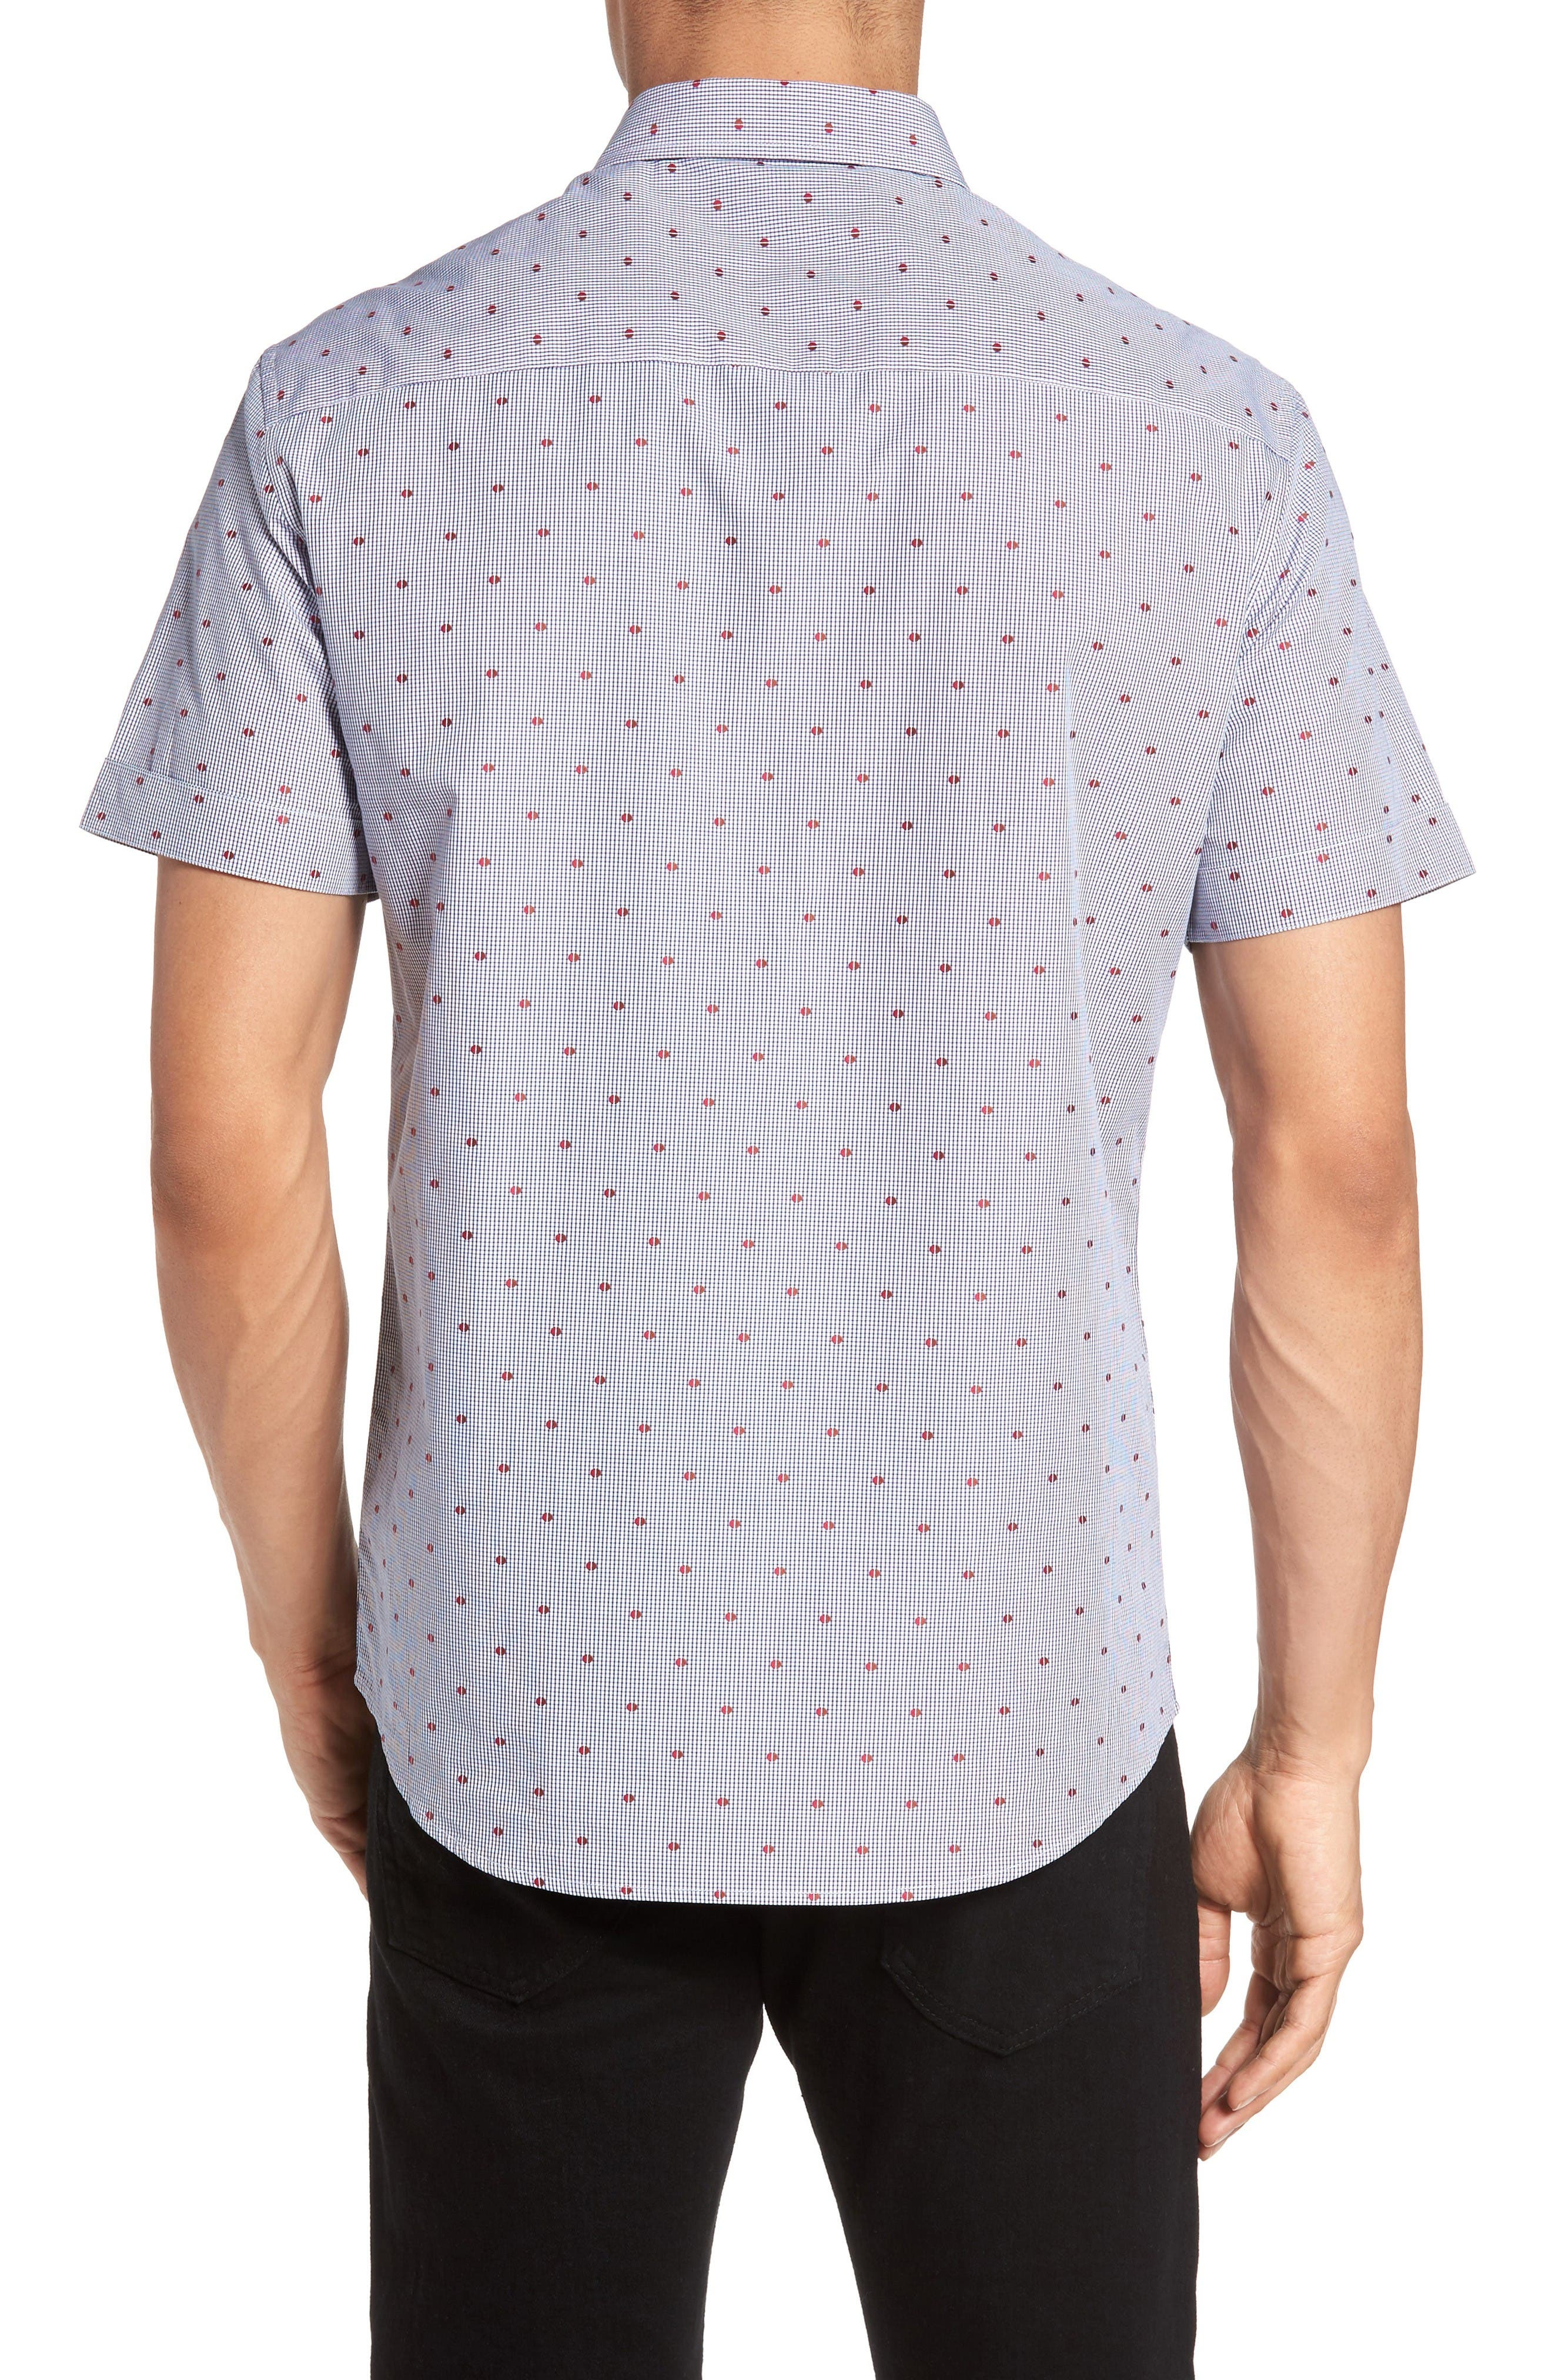 Short Sleeve Sport Shirt,                             Alternate thumbnail 9, color,                             230